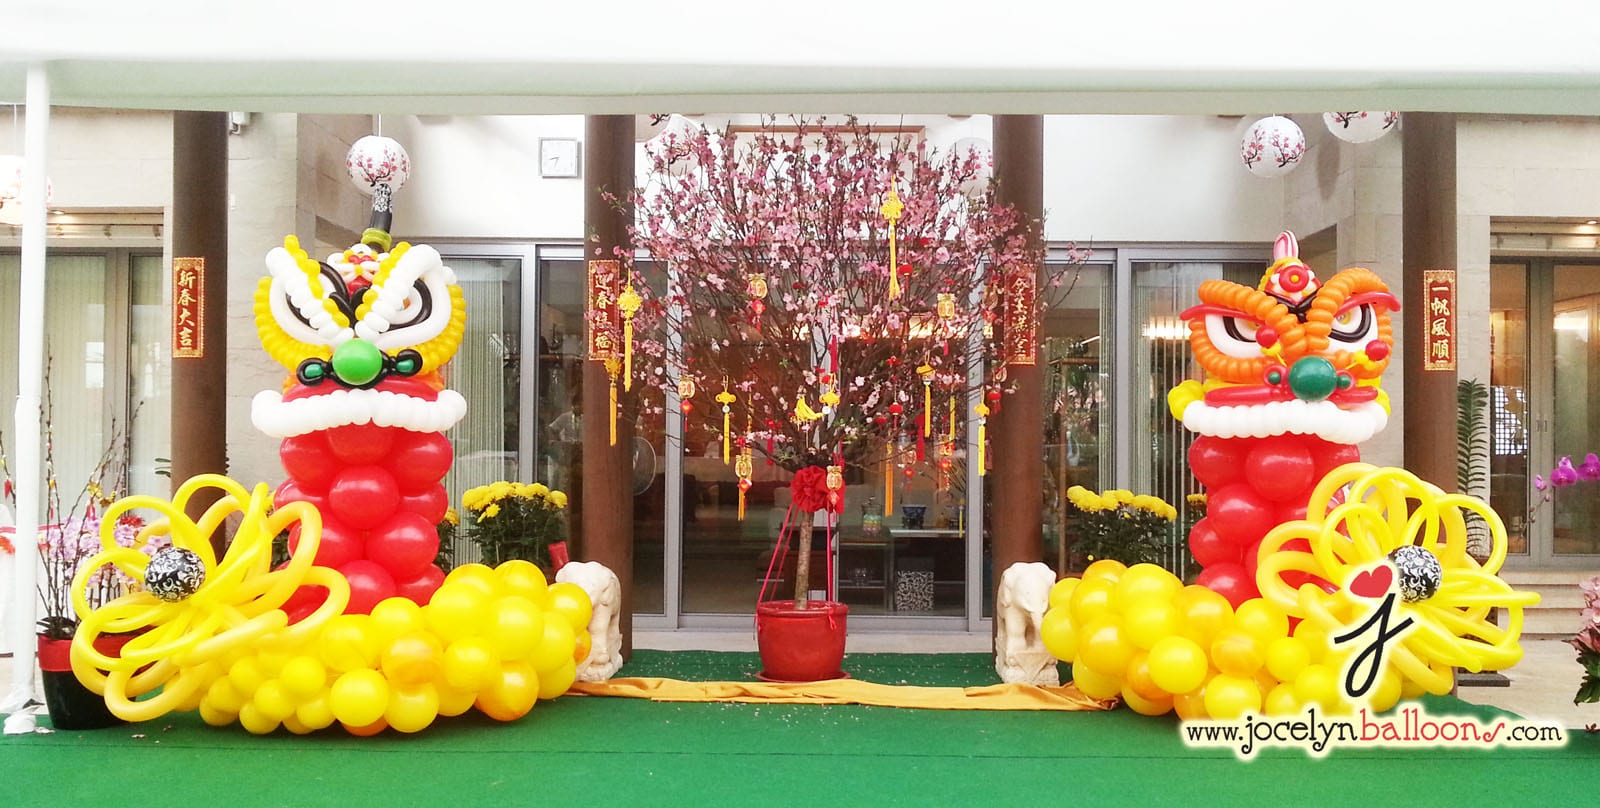 Twin balloon cny lion head jocelynballoons the leading balloon decoration company in singapore